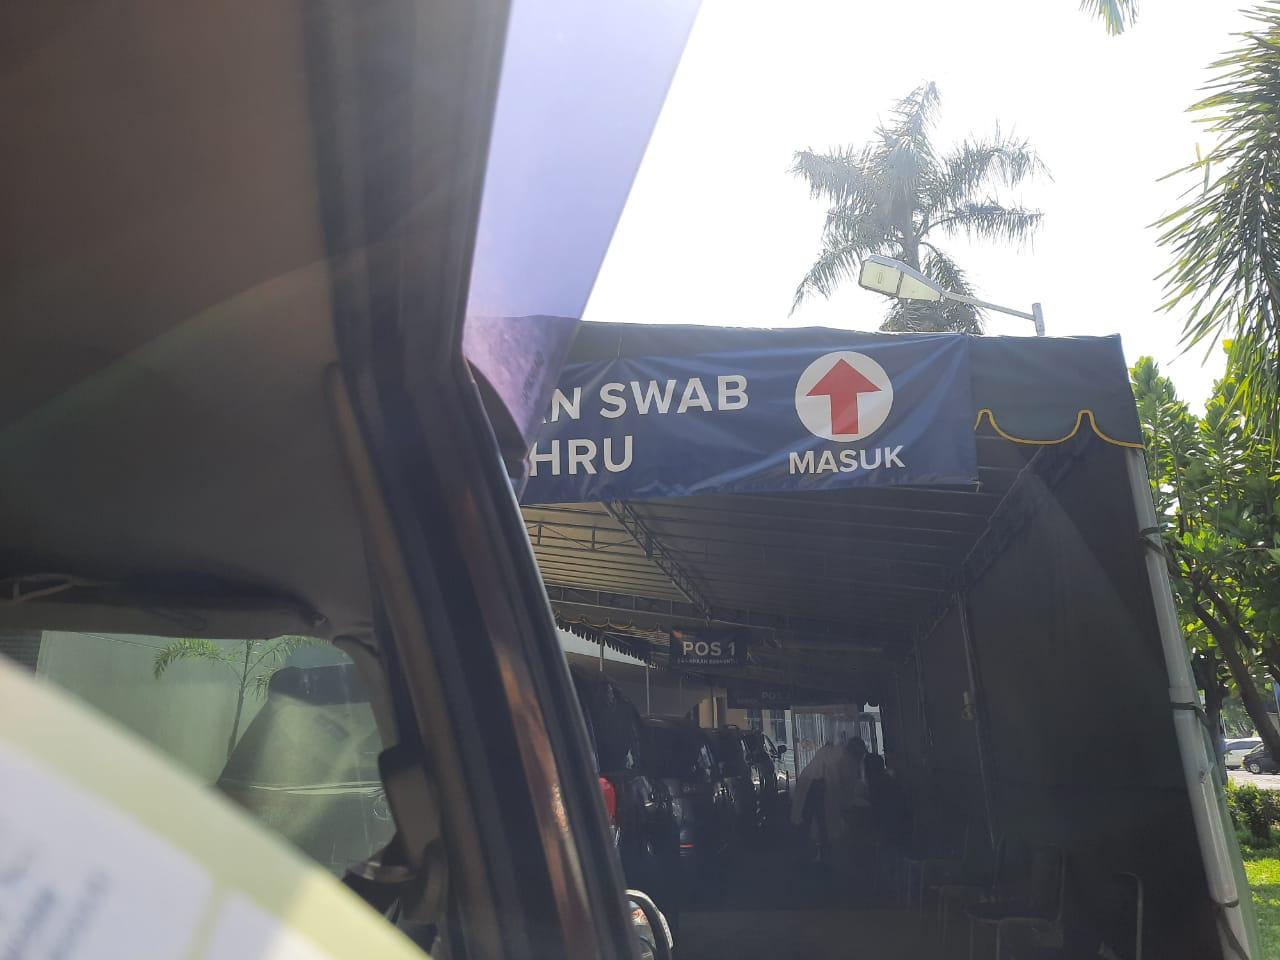 swab test covid drive thru surabaya, swab test drive thru surabaya